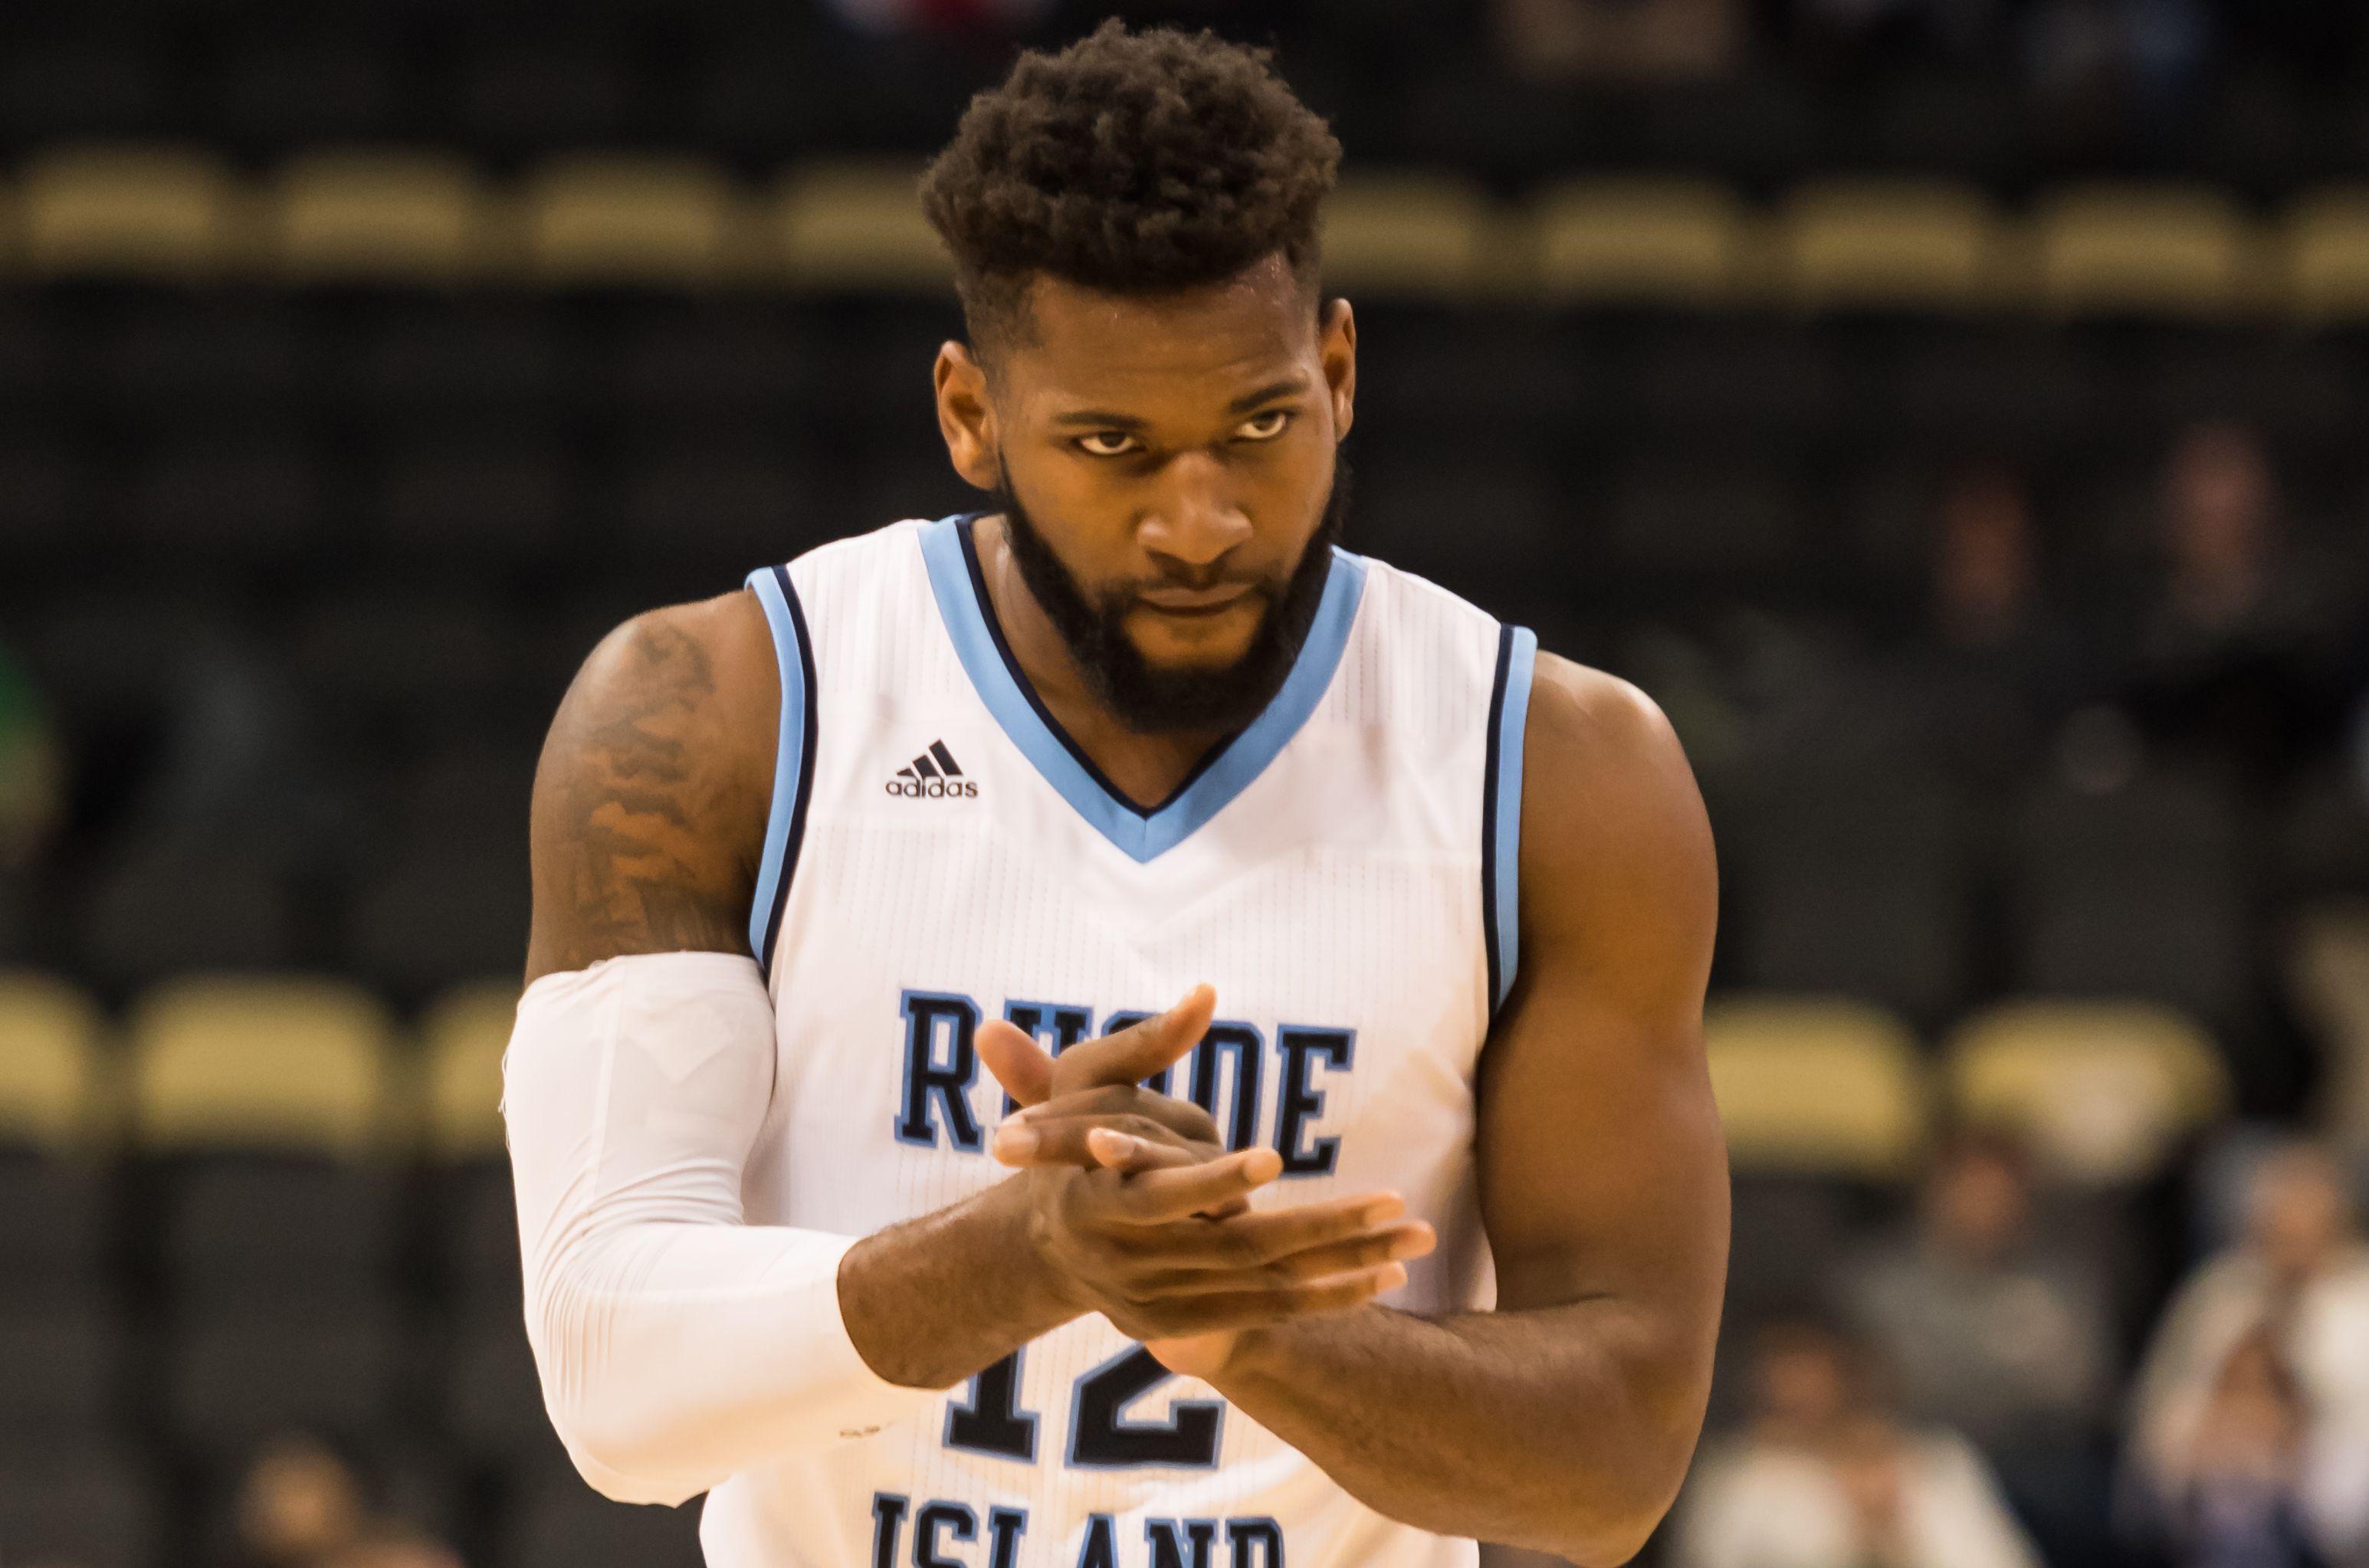 Ncaa-basketball-rhode-island-vs-davidson